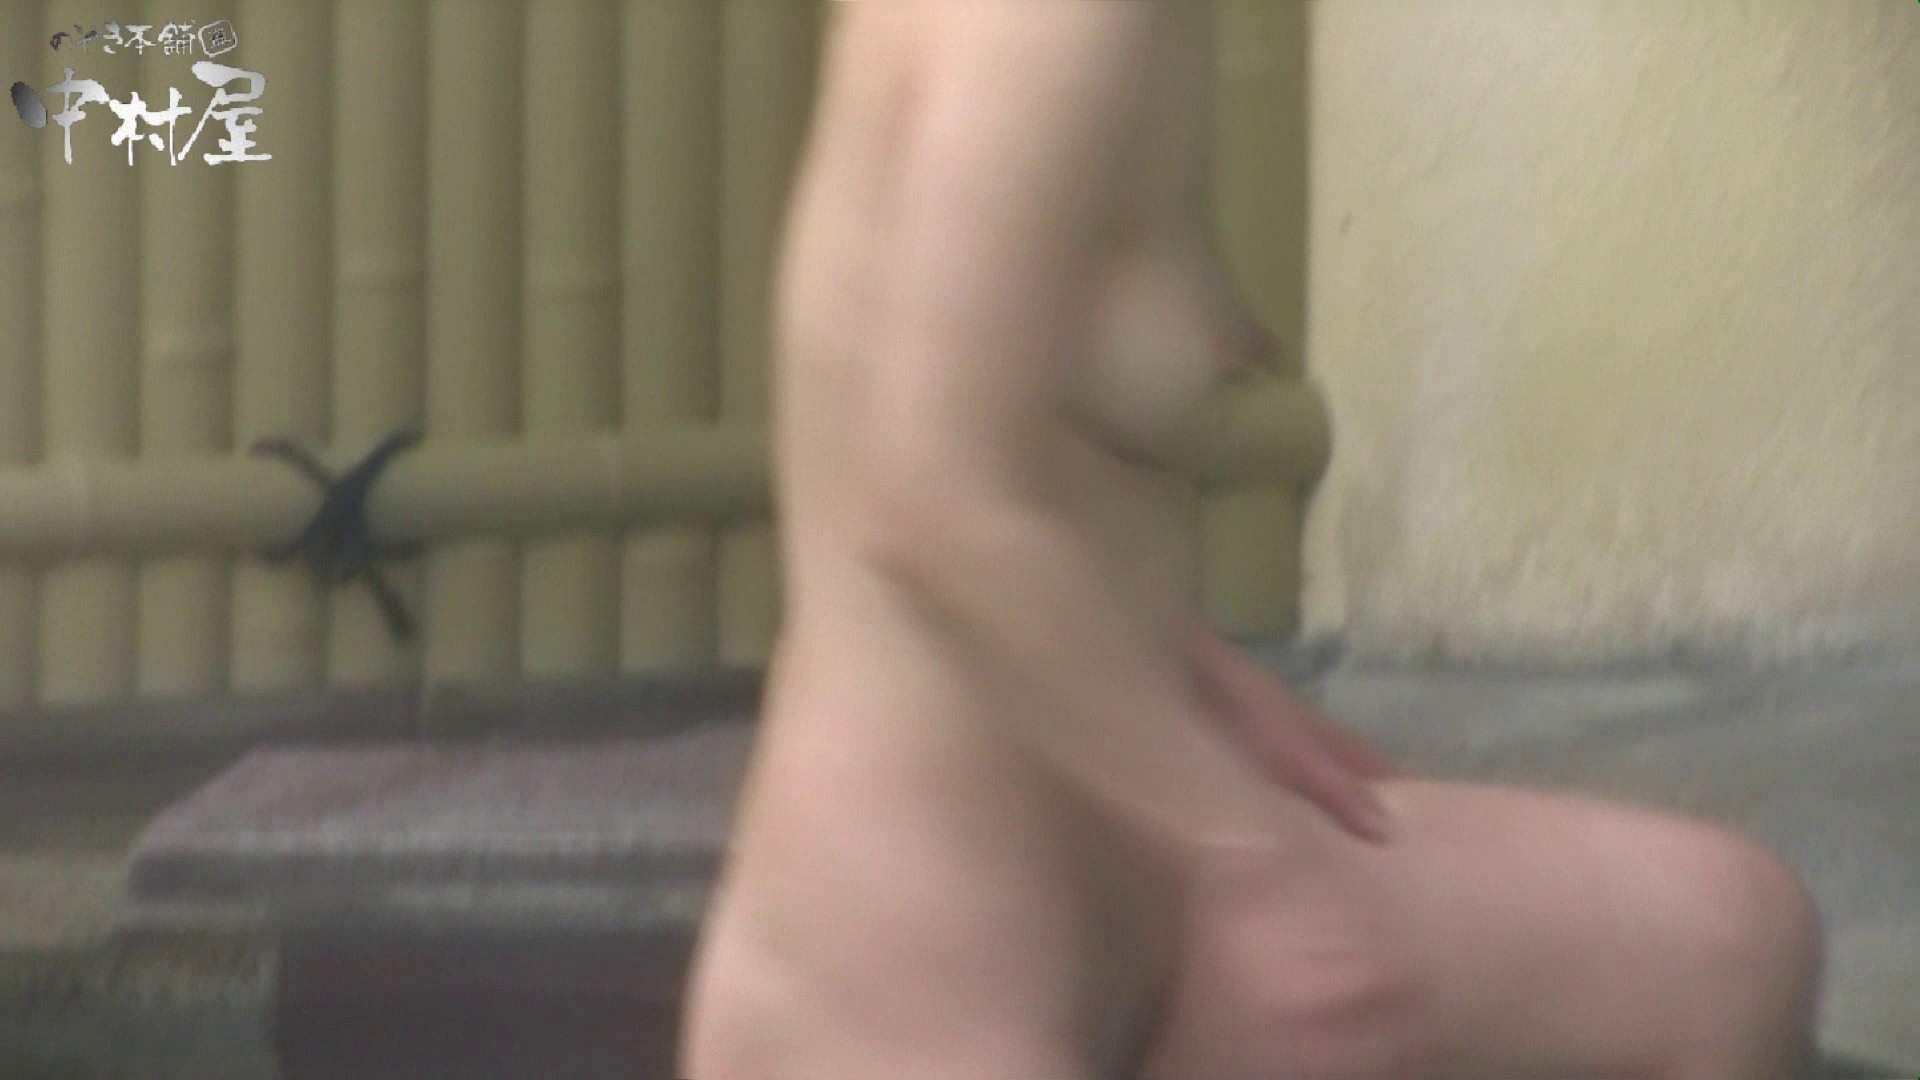 Aquaな露天風呂Vol.927 露天風呂 えろ無修正画像 89連発 14